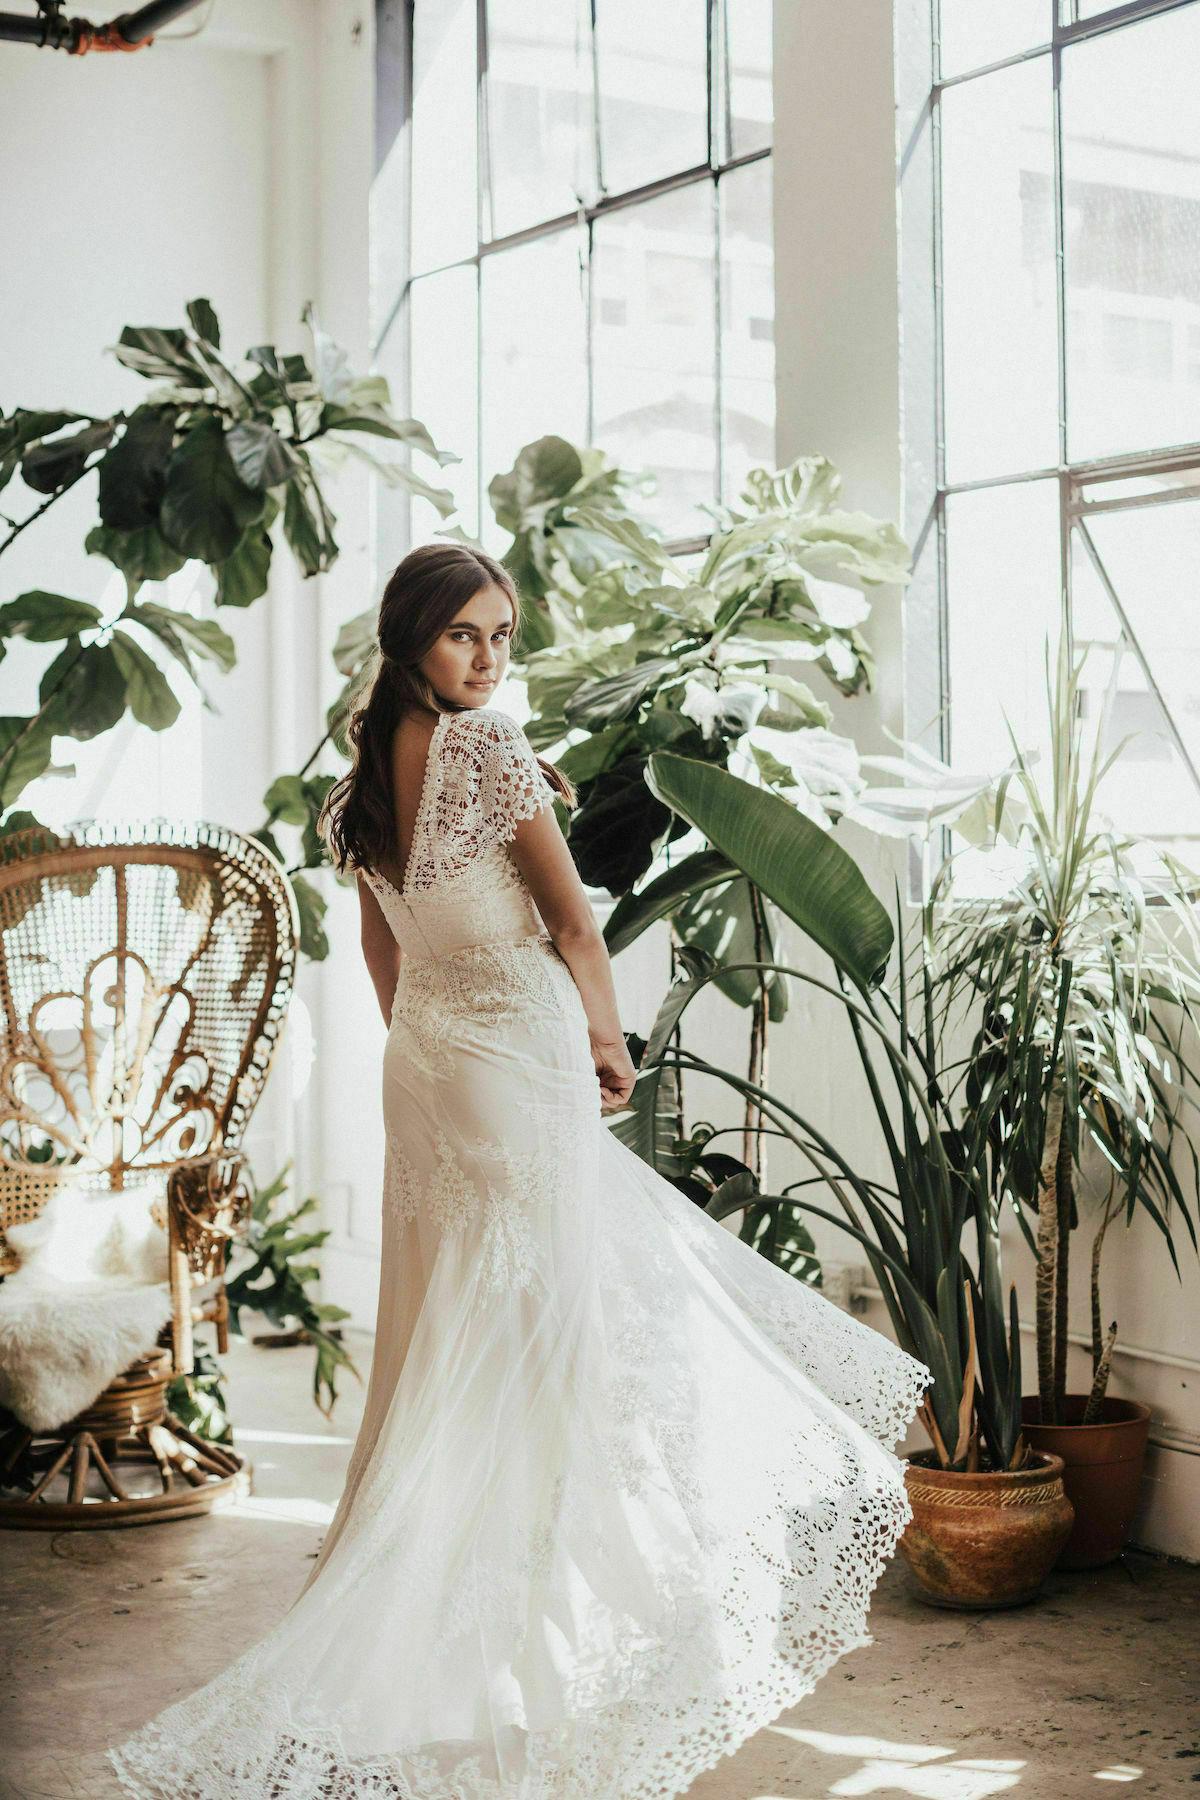 d0b4c7208748 Azalea Boho Cotton Lace Wedding Dress | Dreamers and Lovers